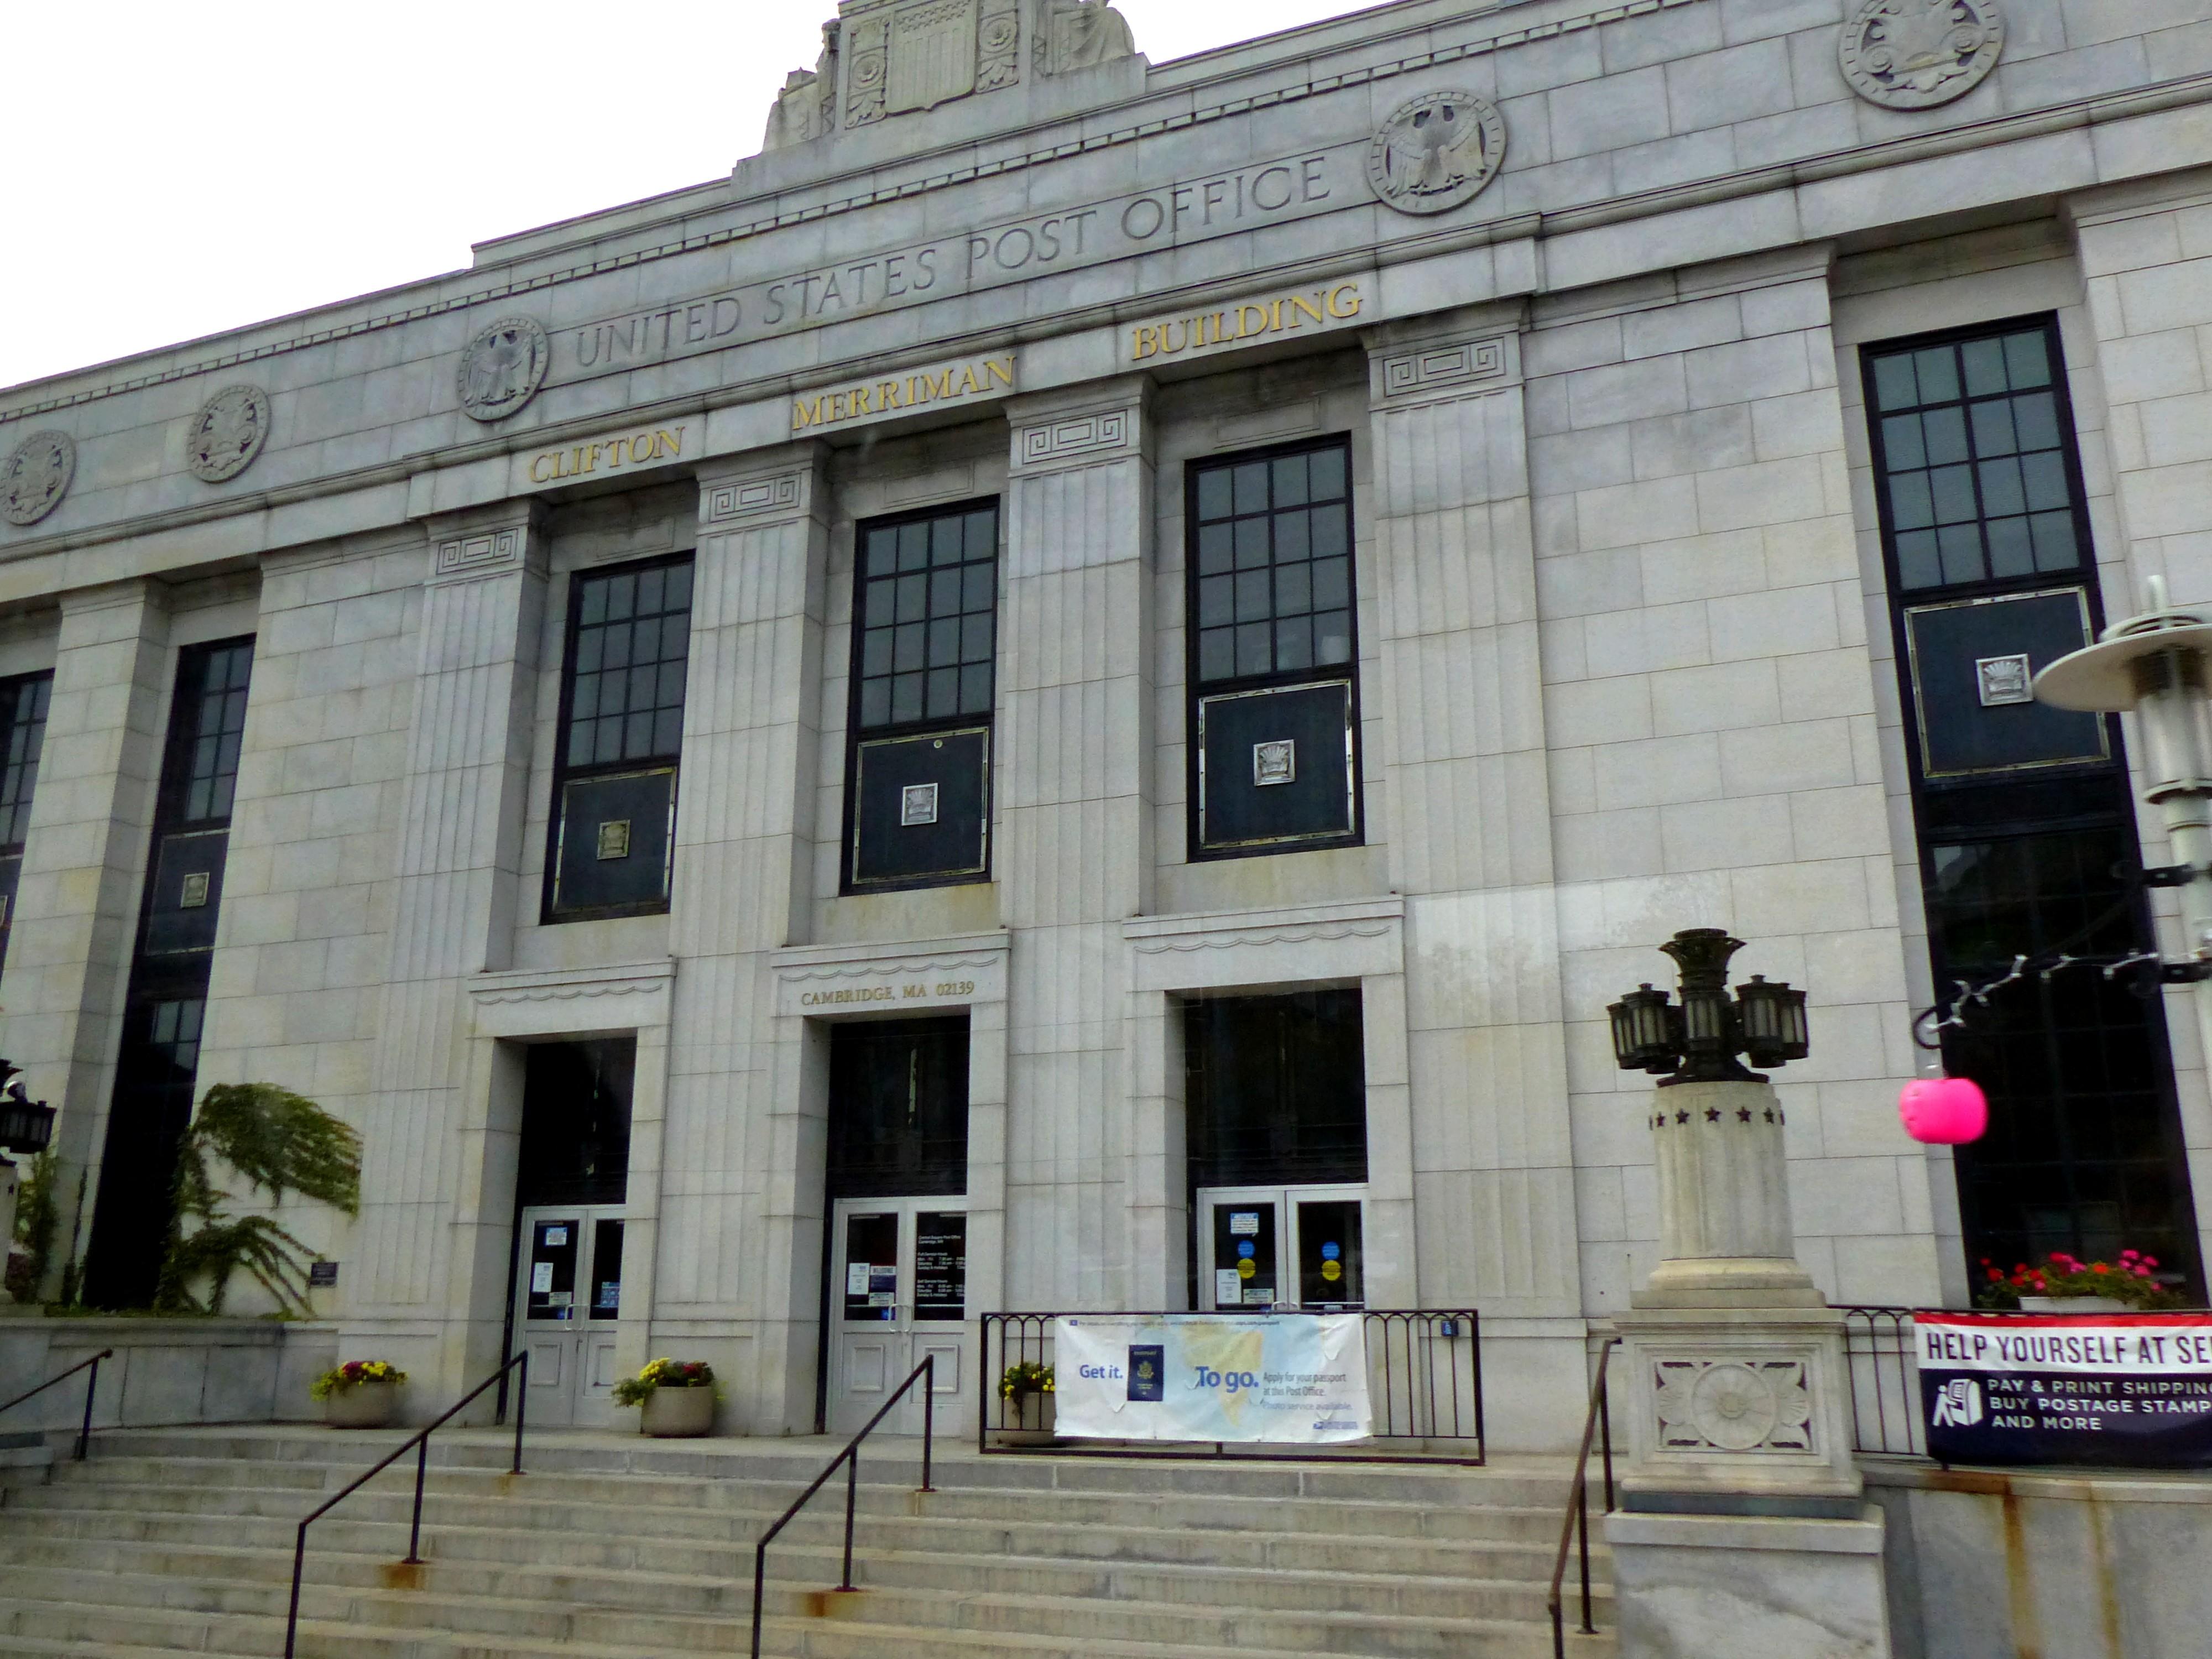 Filecambridge usa clifton merriman post office building filecambridge usa clifton merriman post office building panoramiog solutioingenieria Gallery